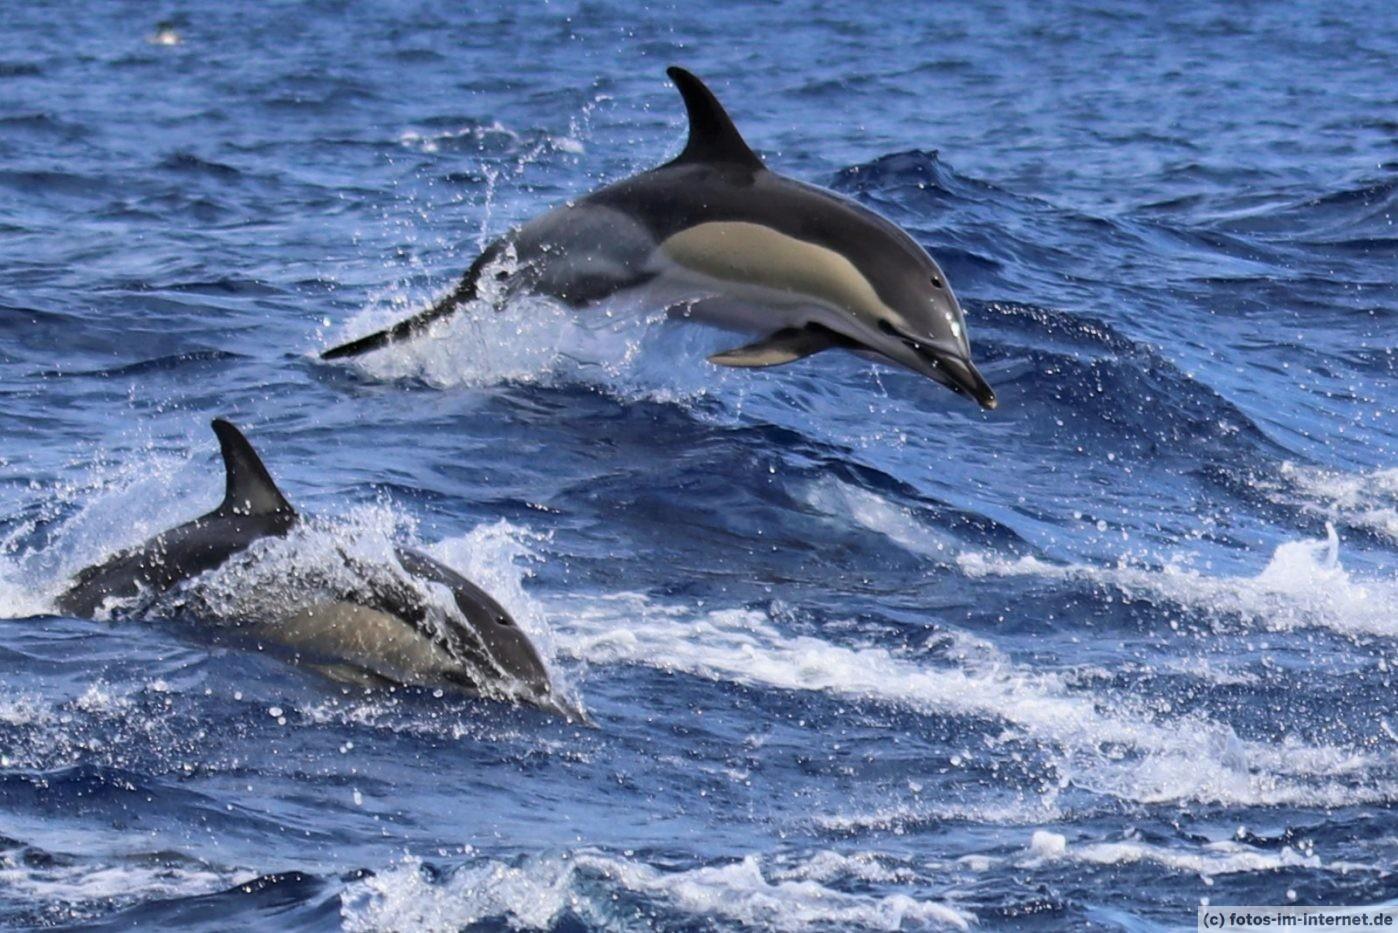 Azoren Urlaub - Zwei springende Delfine